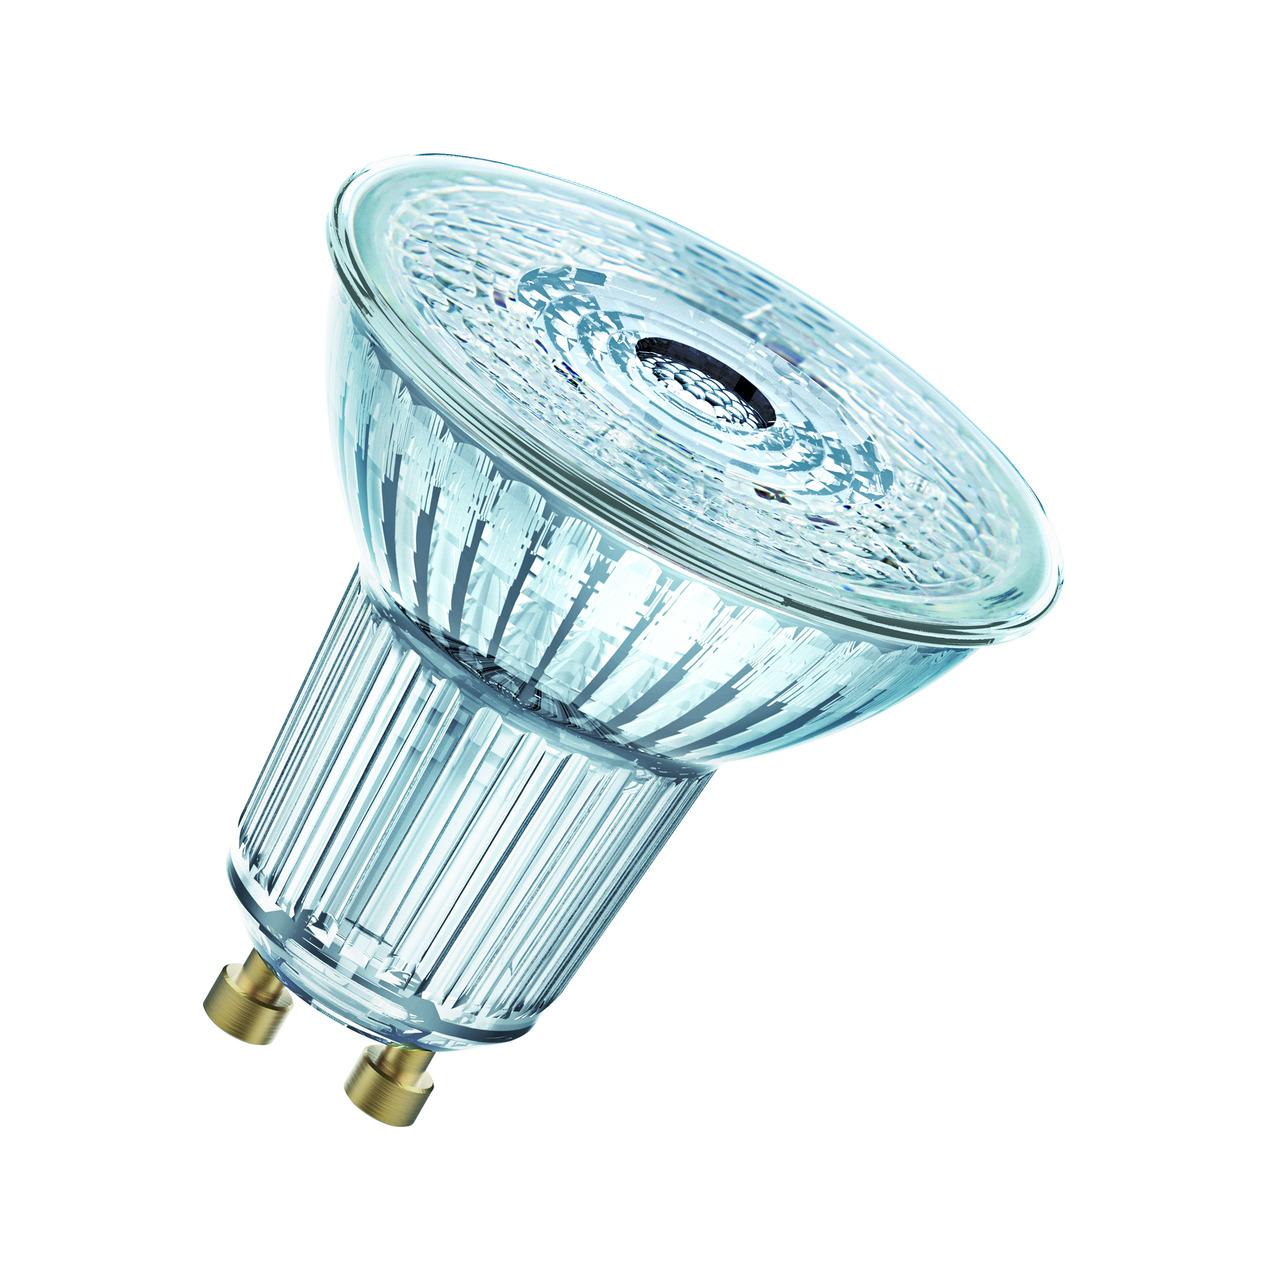 OSRAM 3er Set 4-3-W-LED-Lampe PAR51- GU10- 350 lm- neutralweiss- 36-